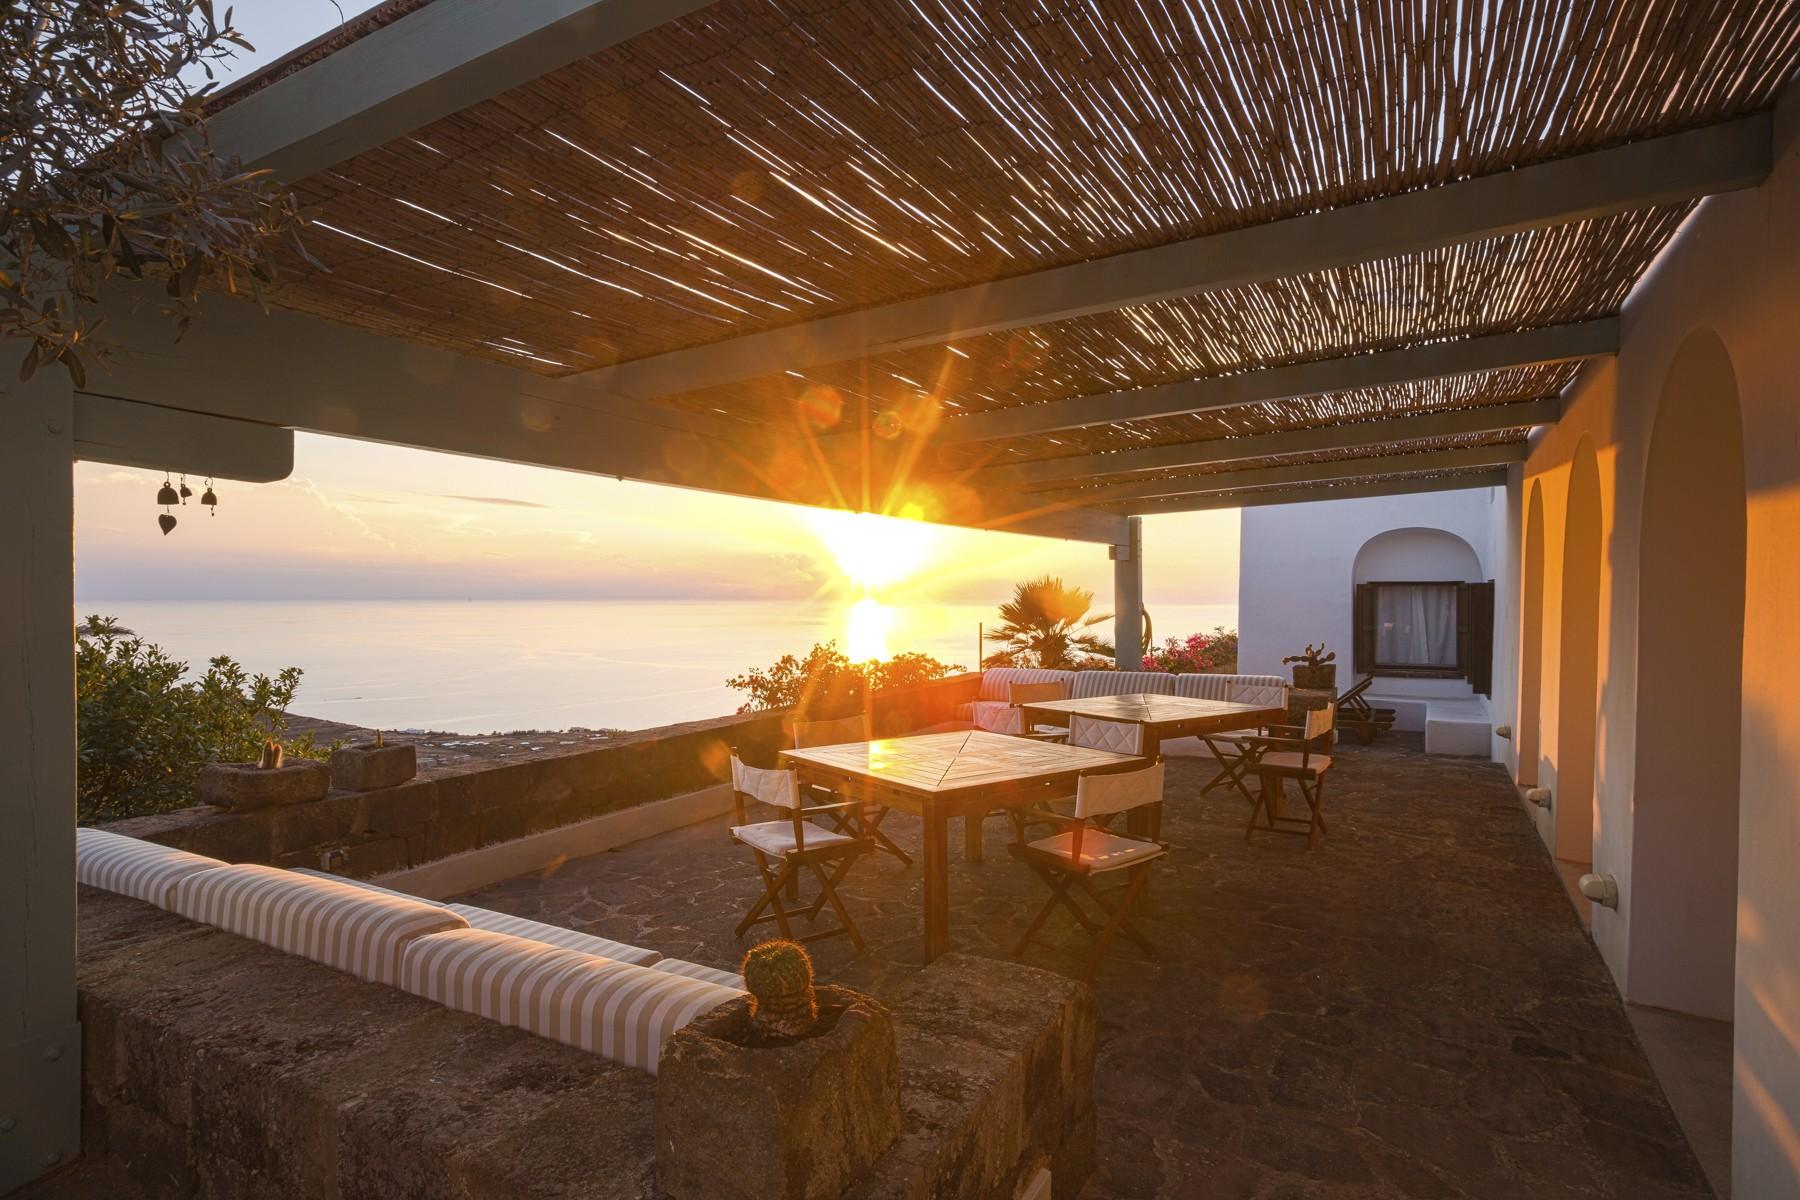 Villa in Vendita a Pantelleria: 5 locali, 530 mq - Foto 1